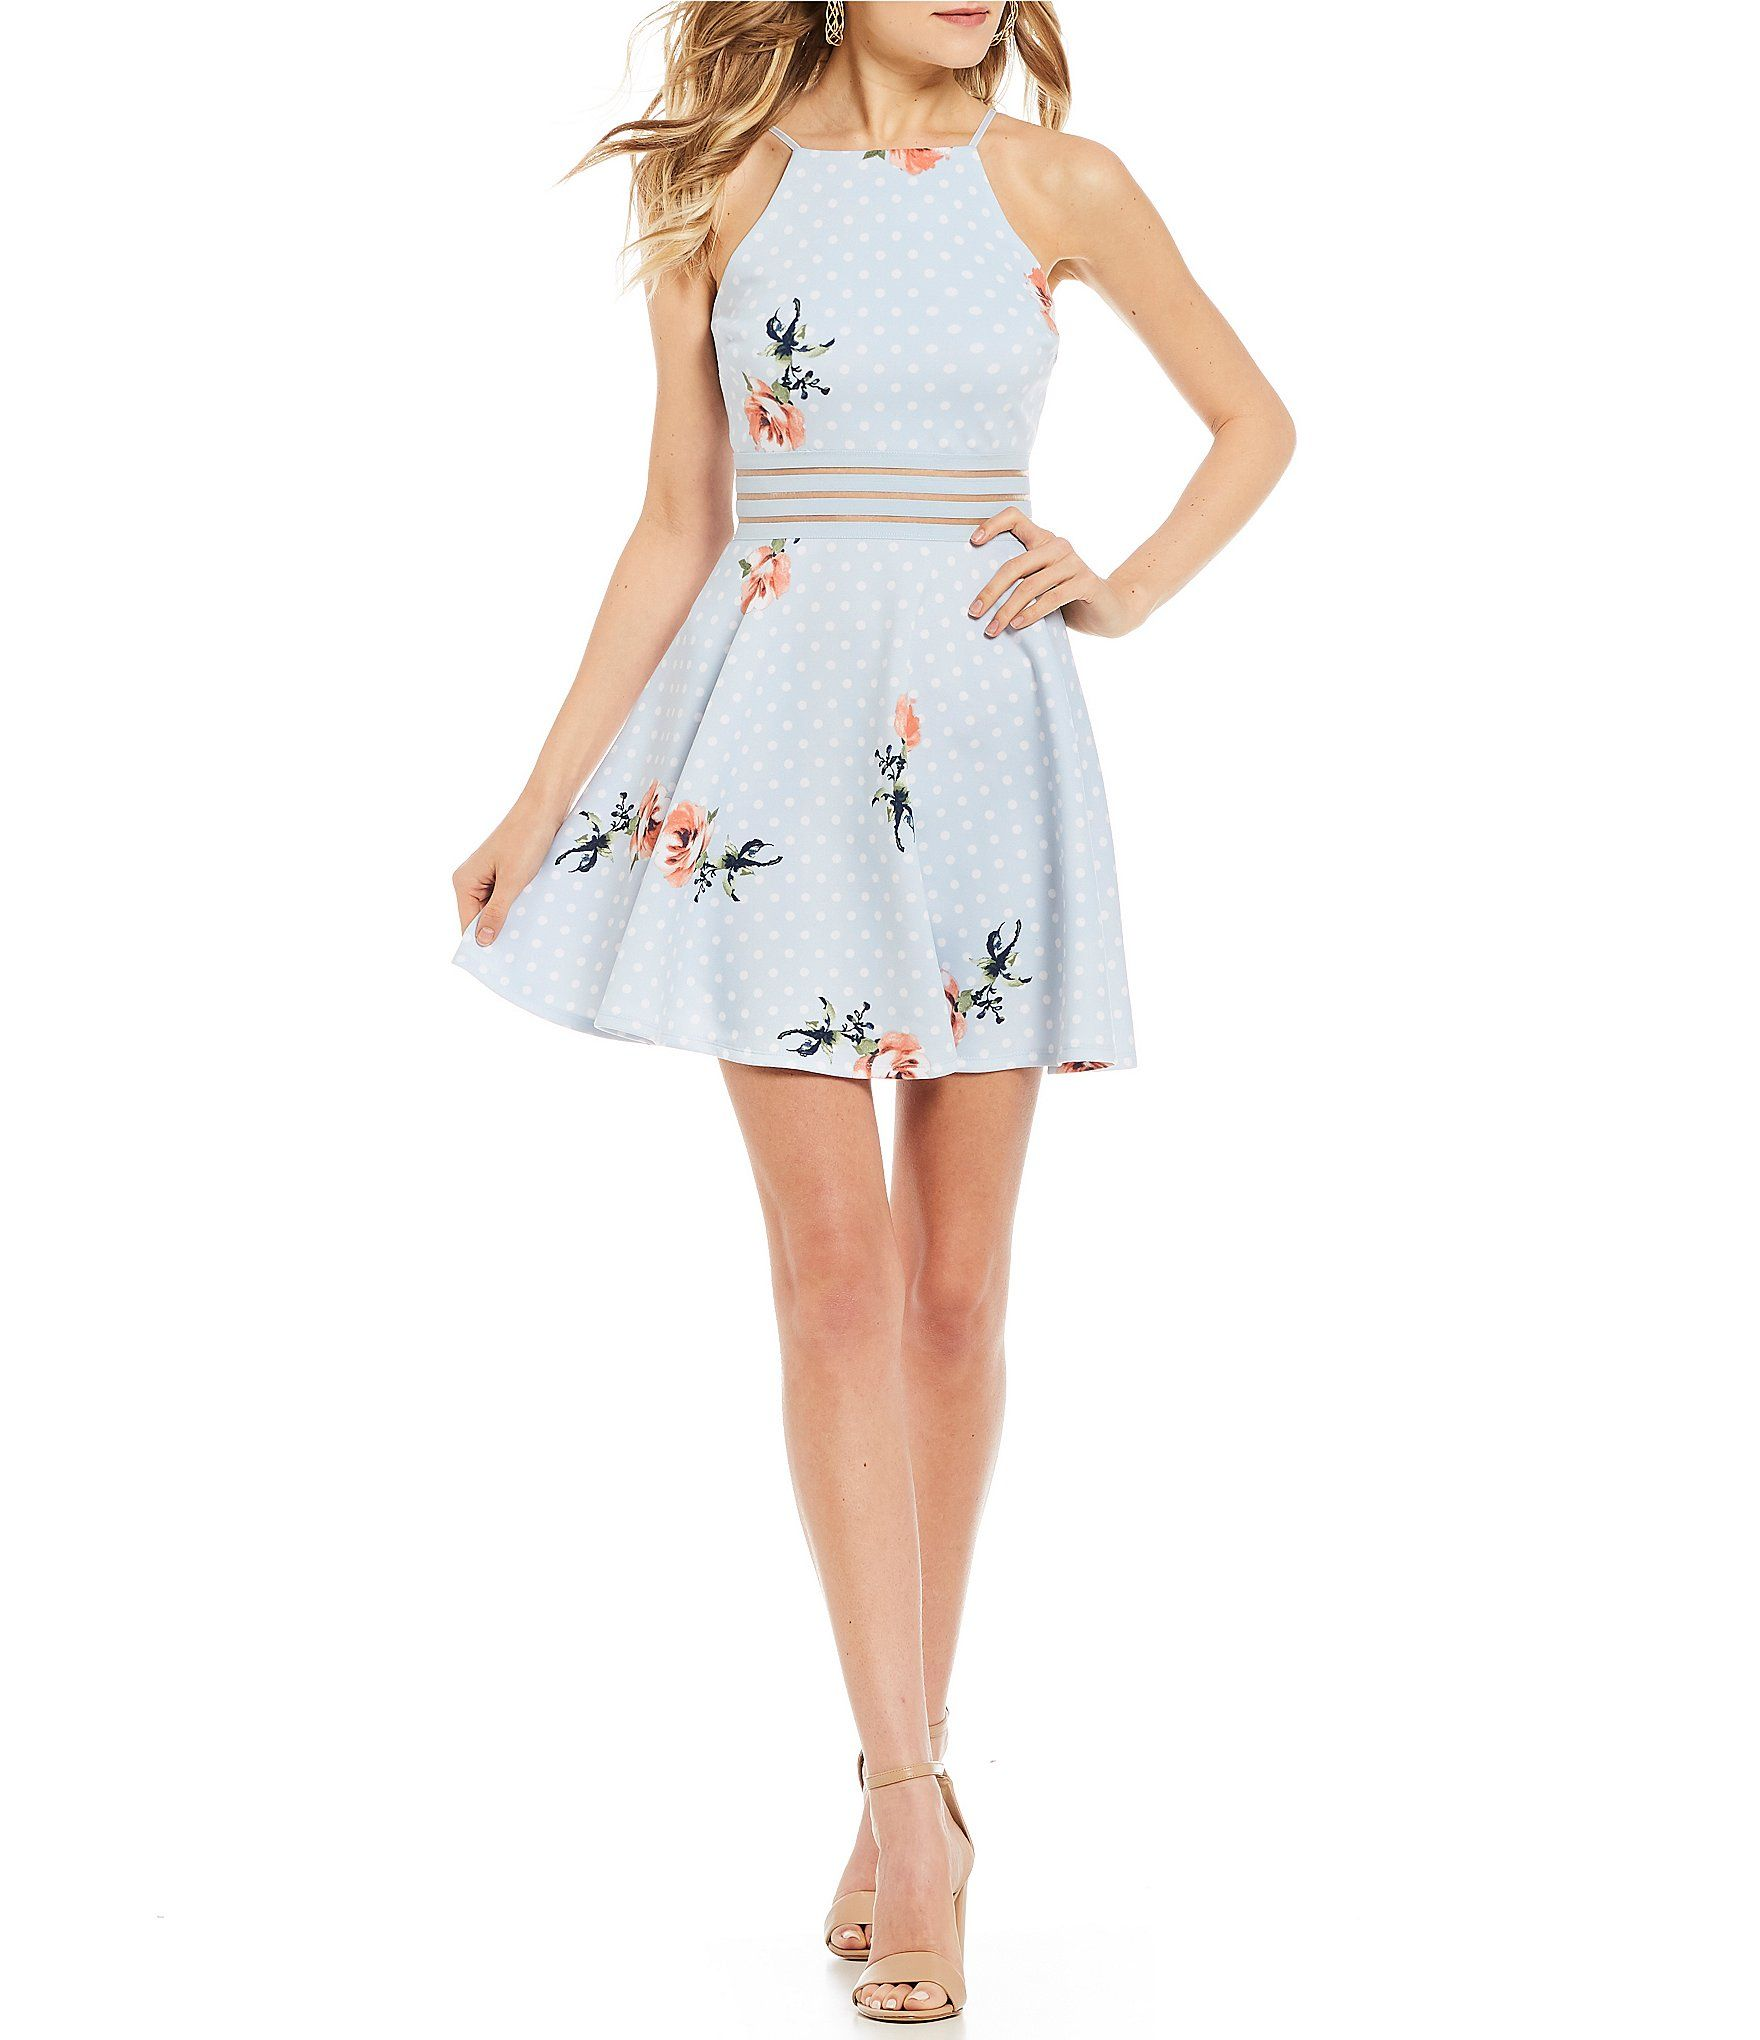 8e0a19a1e9 Jodi Kristopher Dot and Floral Print FitAndFlare Dress  Dillards ...